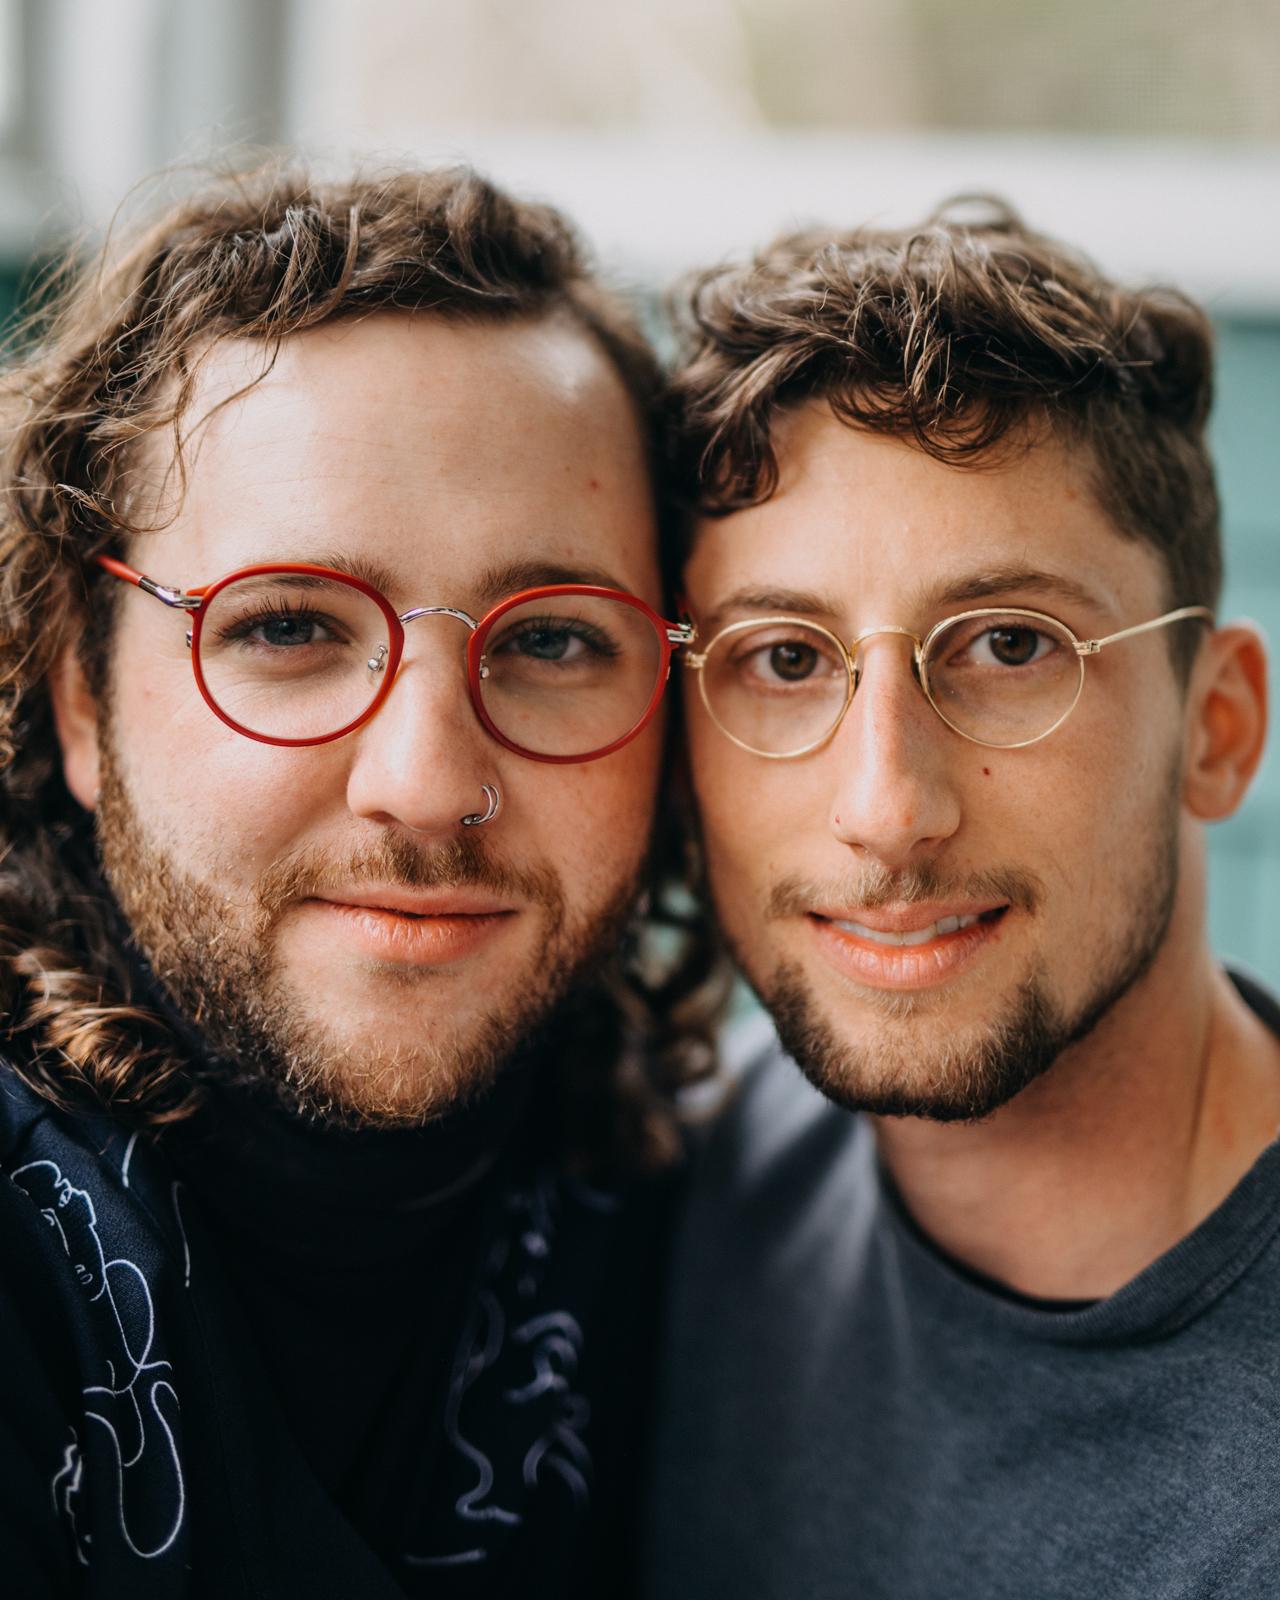 trans-couple-queer-photographer21.jpg